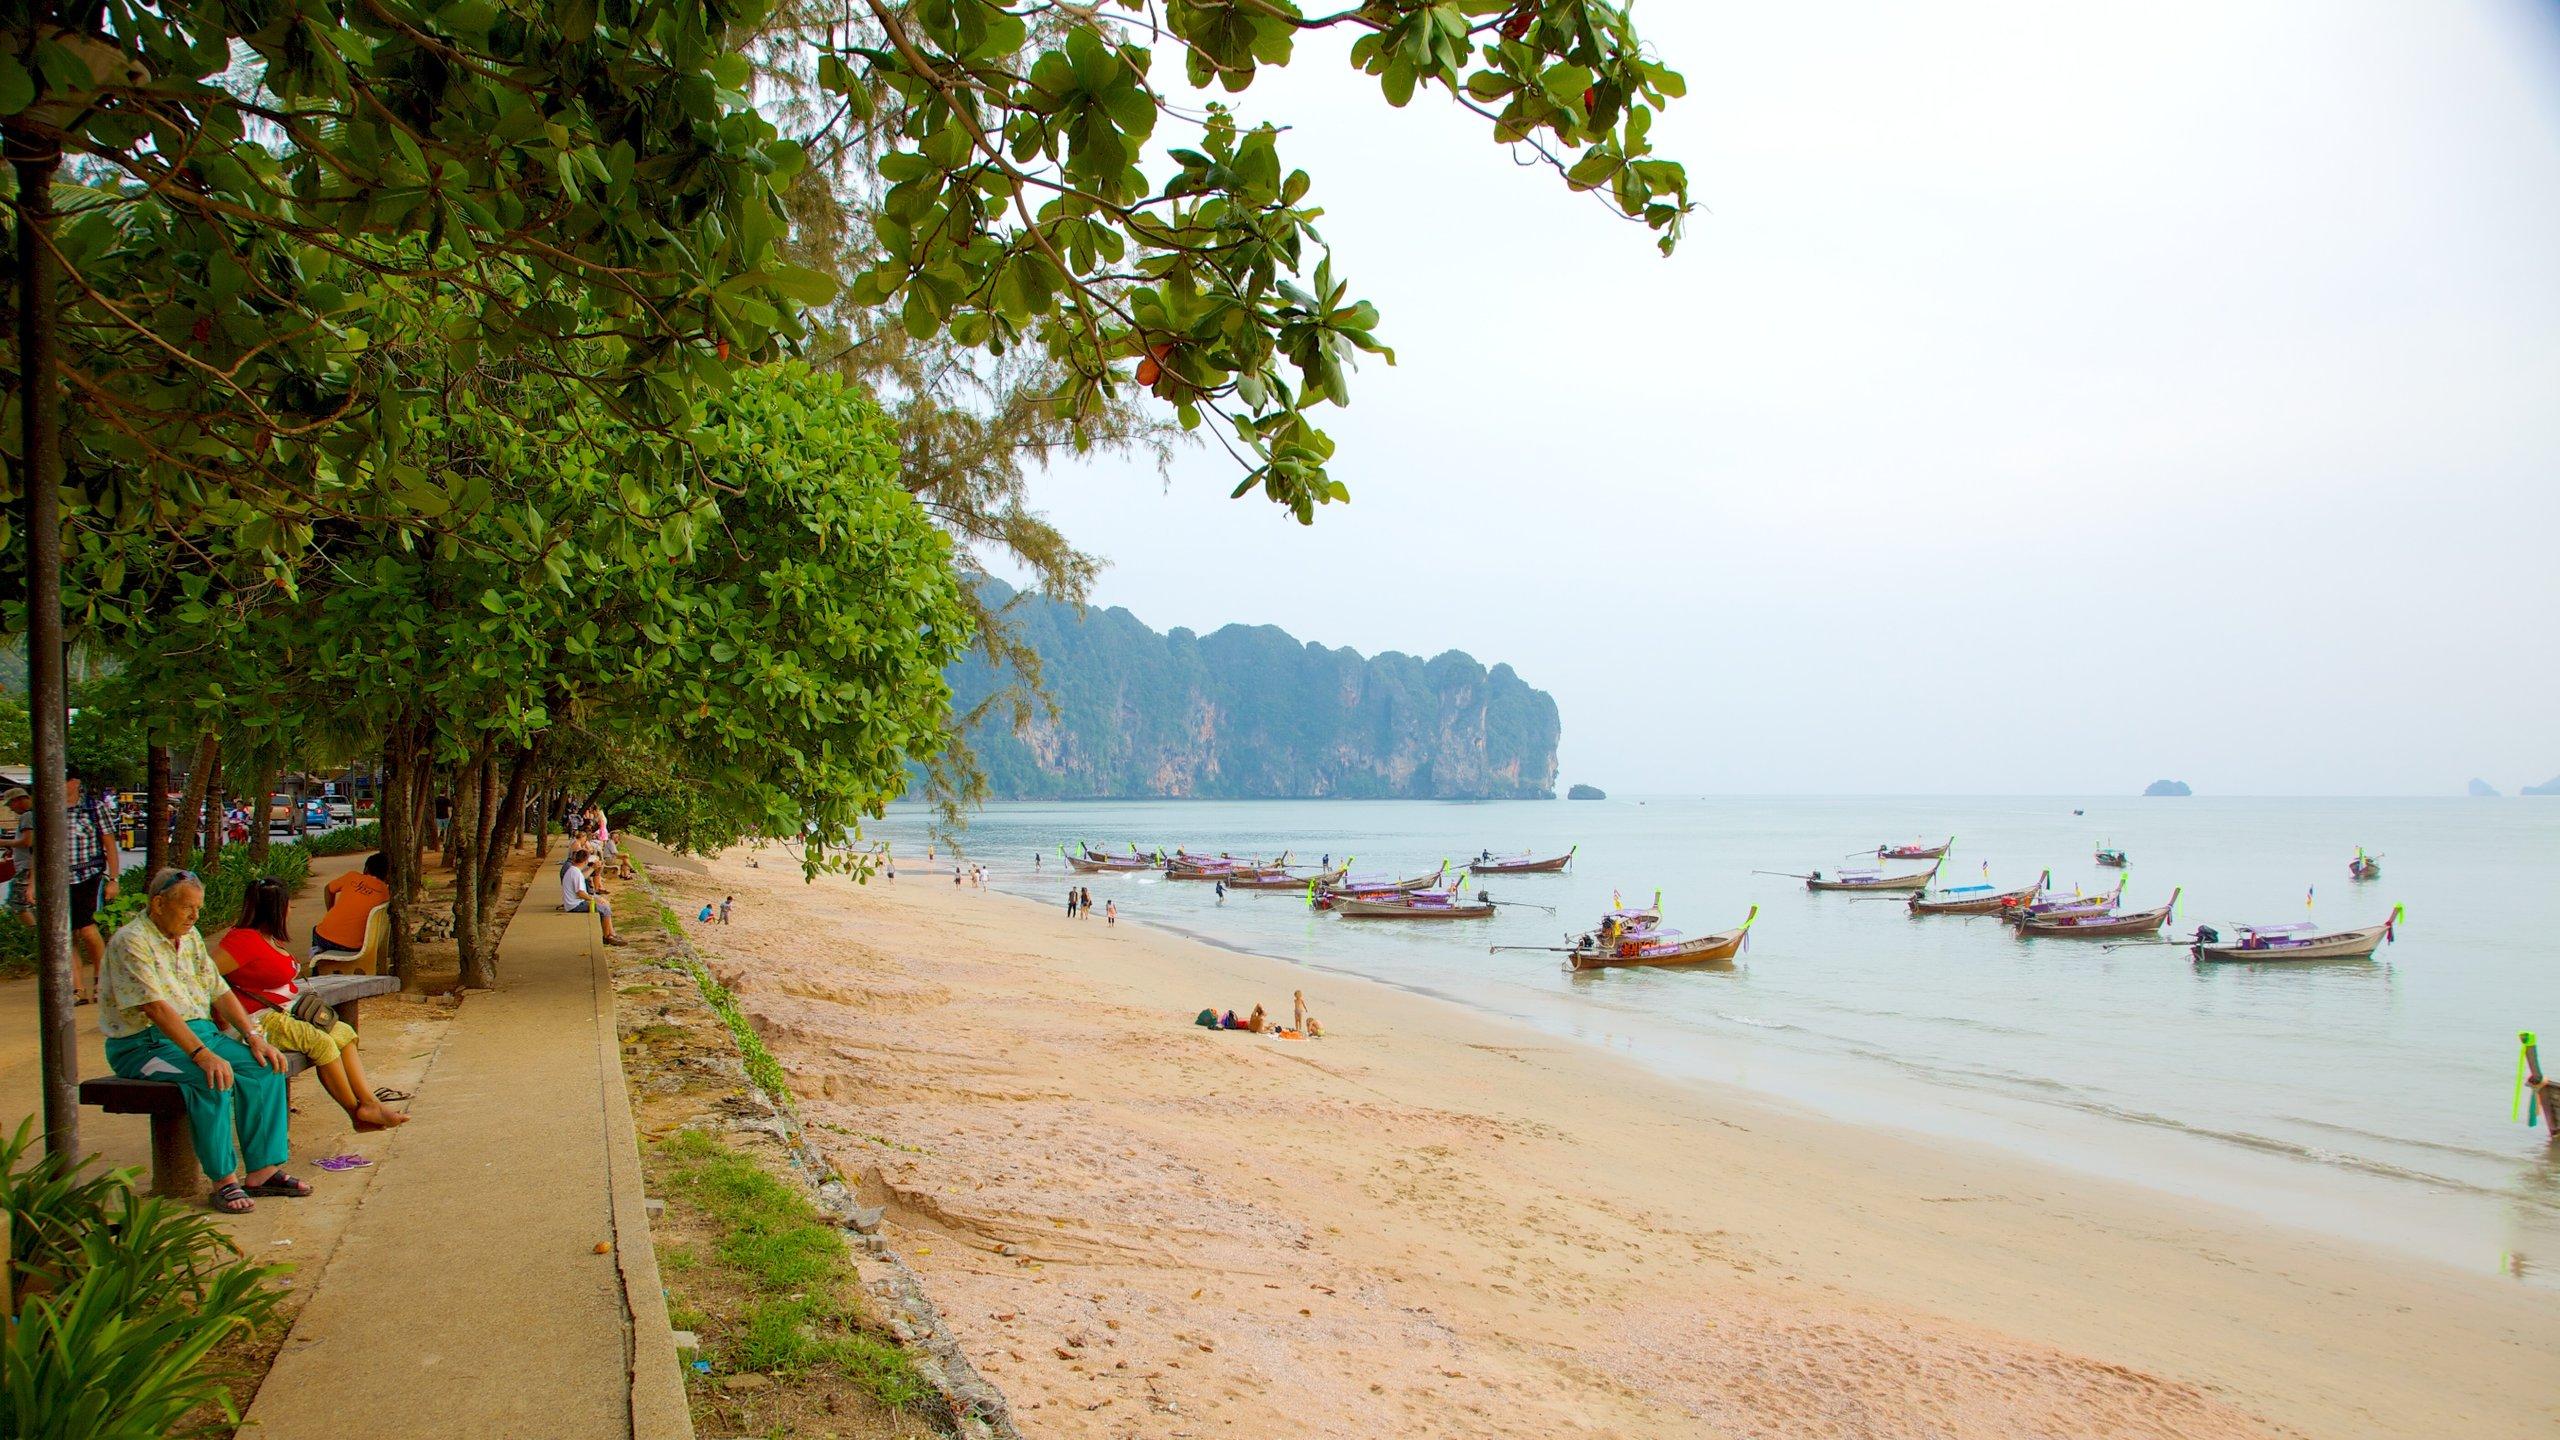 Ao Nang Beach, Krabi, Krabi Province, Thailand